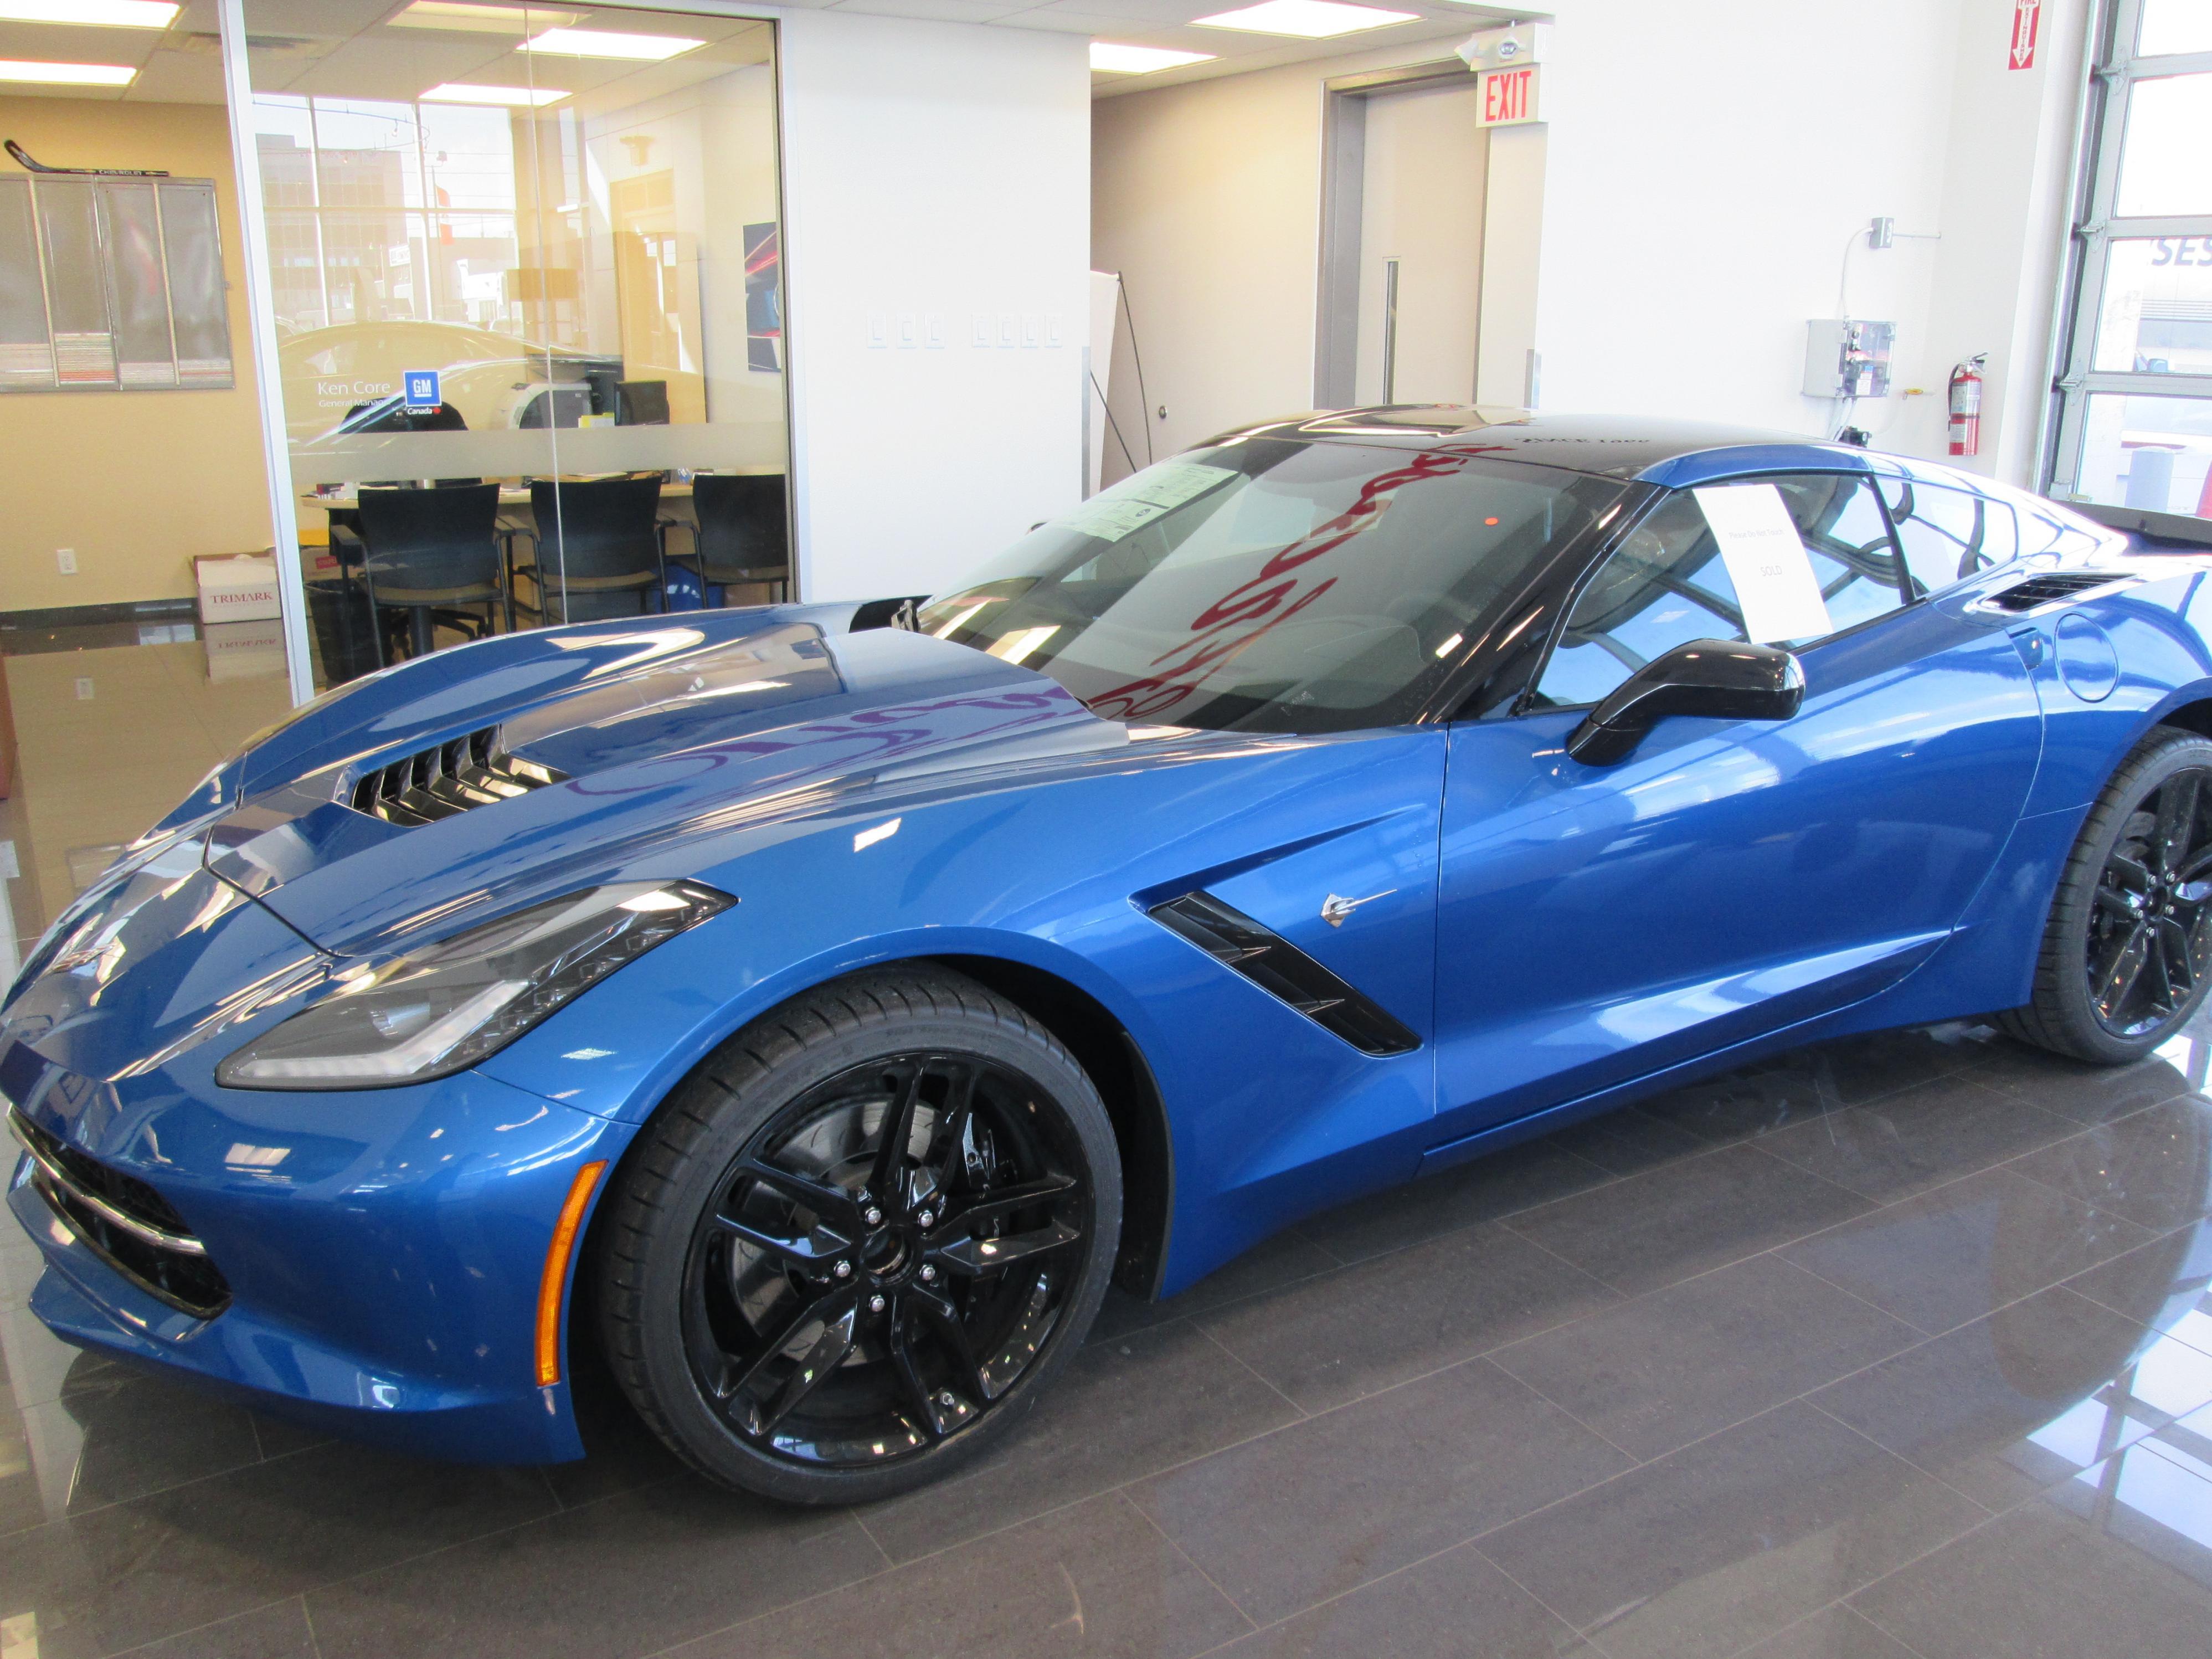 name 002jpg views 23310 size 10084 kb blue 2014 chevy corvette c7 stingray - Corvette Stingray Light Blue